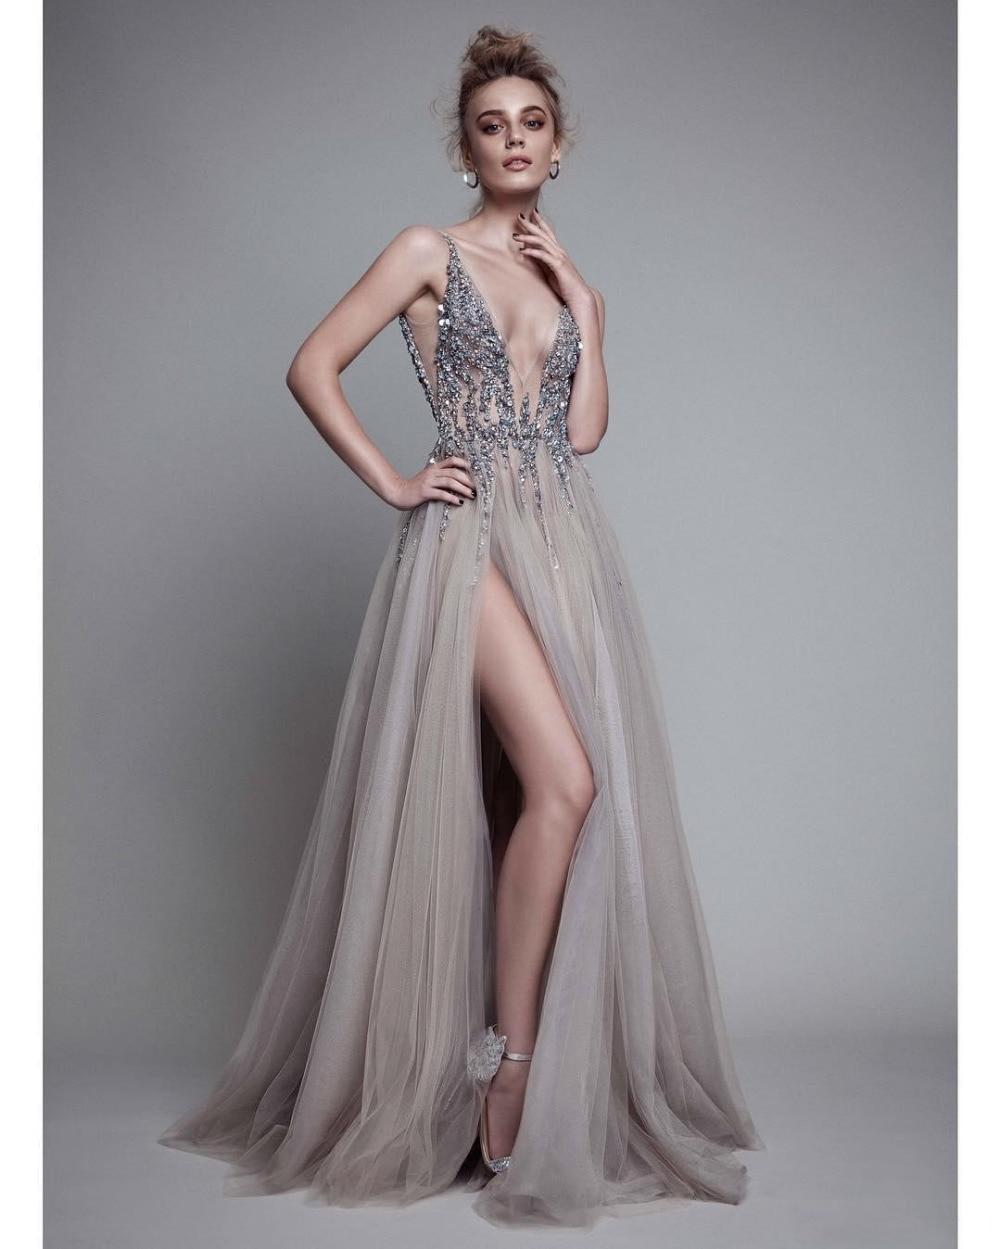 Wholesales Prom Dresses 93